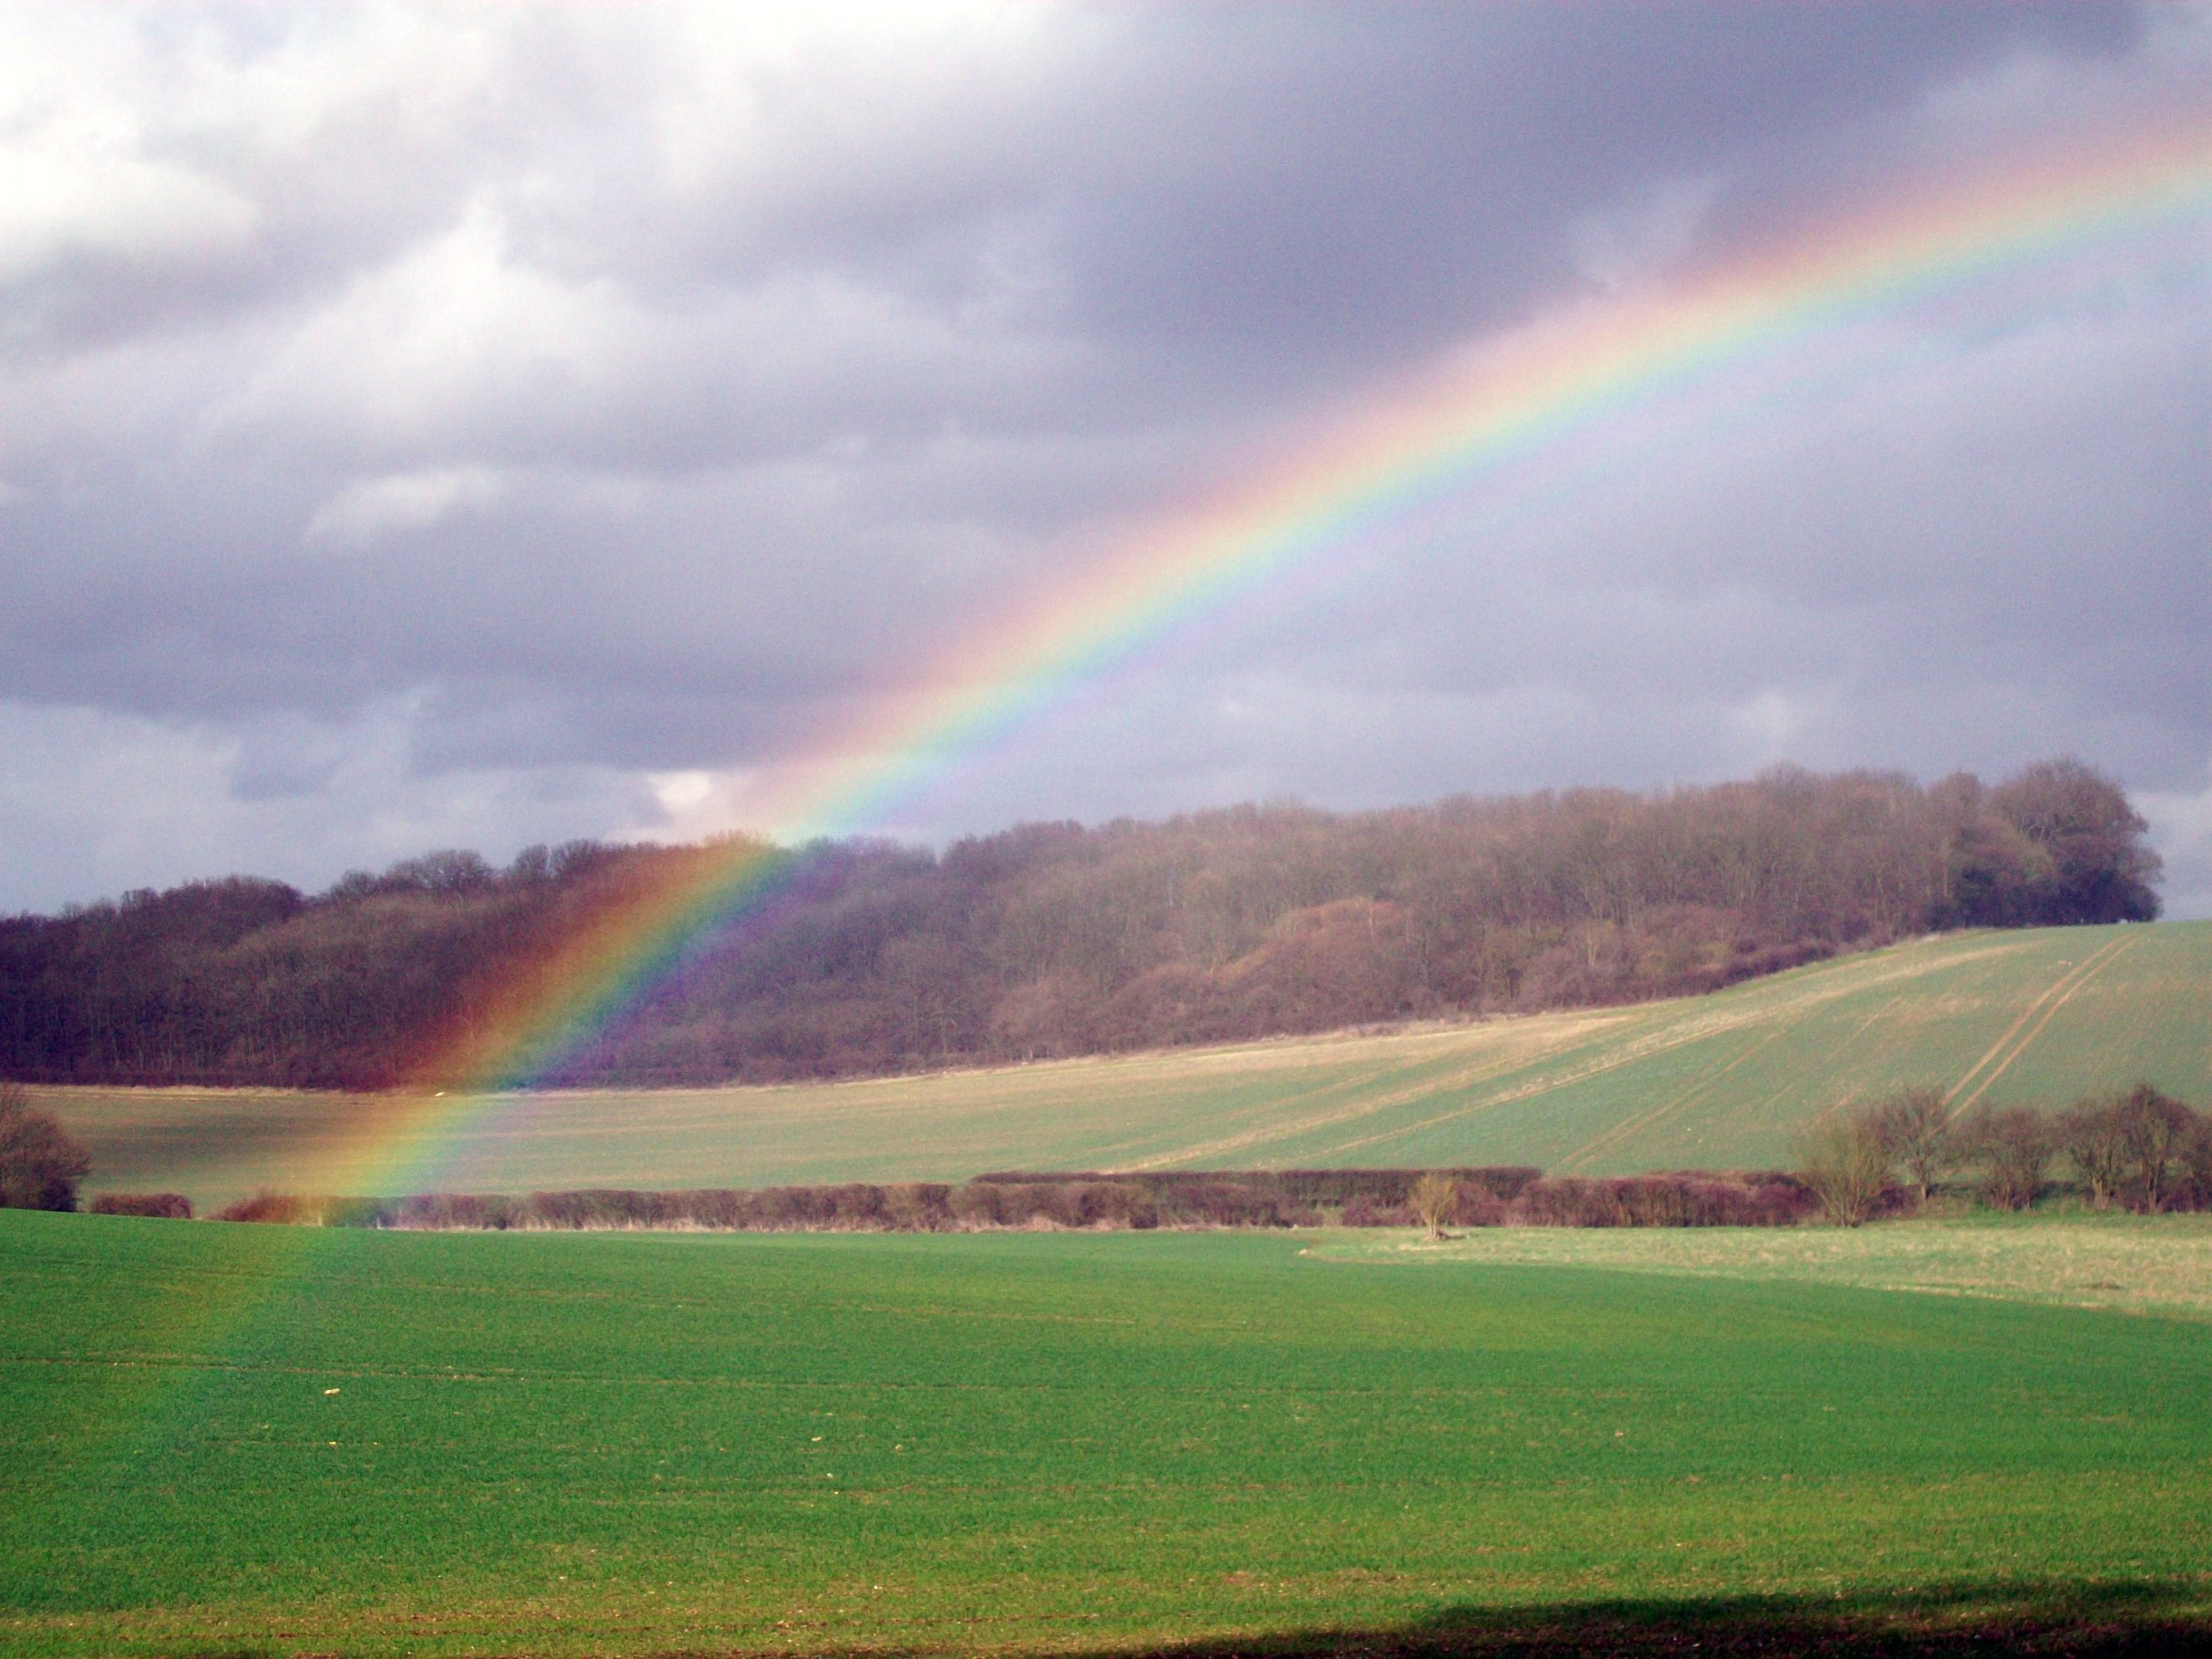 File:Amazing rainbow 1 4464551889.jpg  Wikimedia Commons